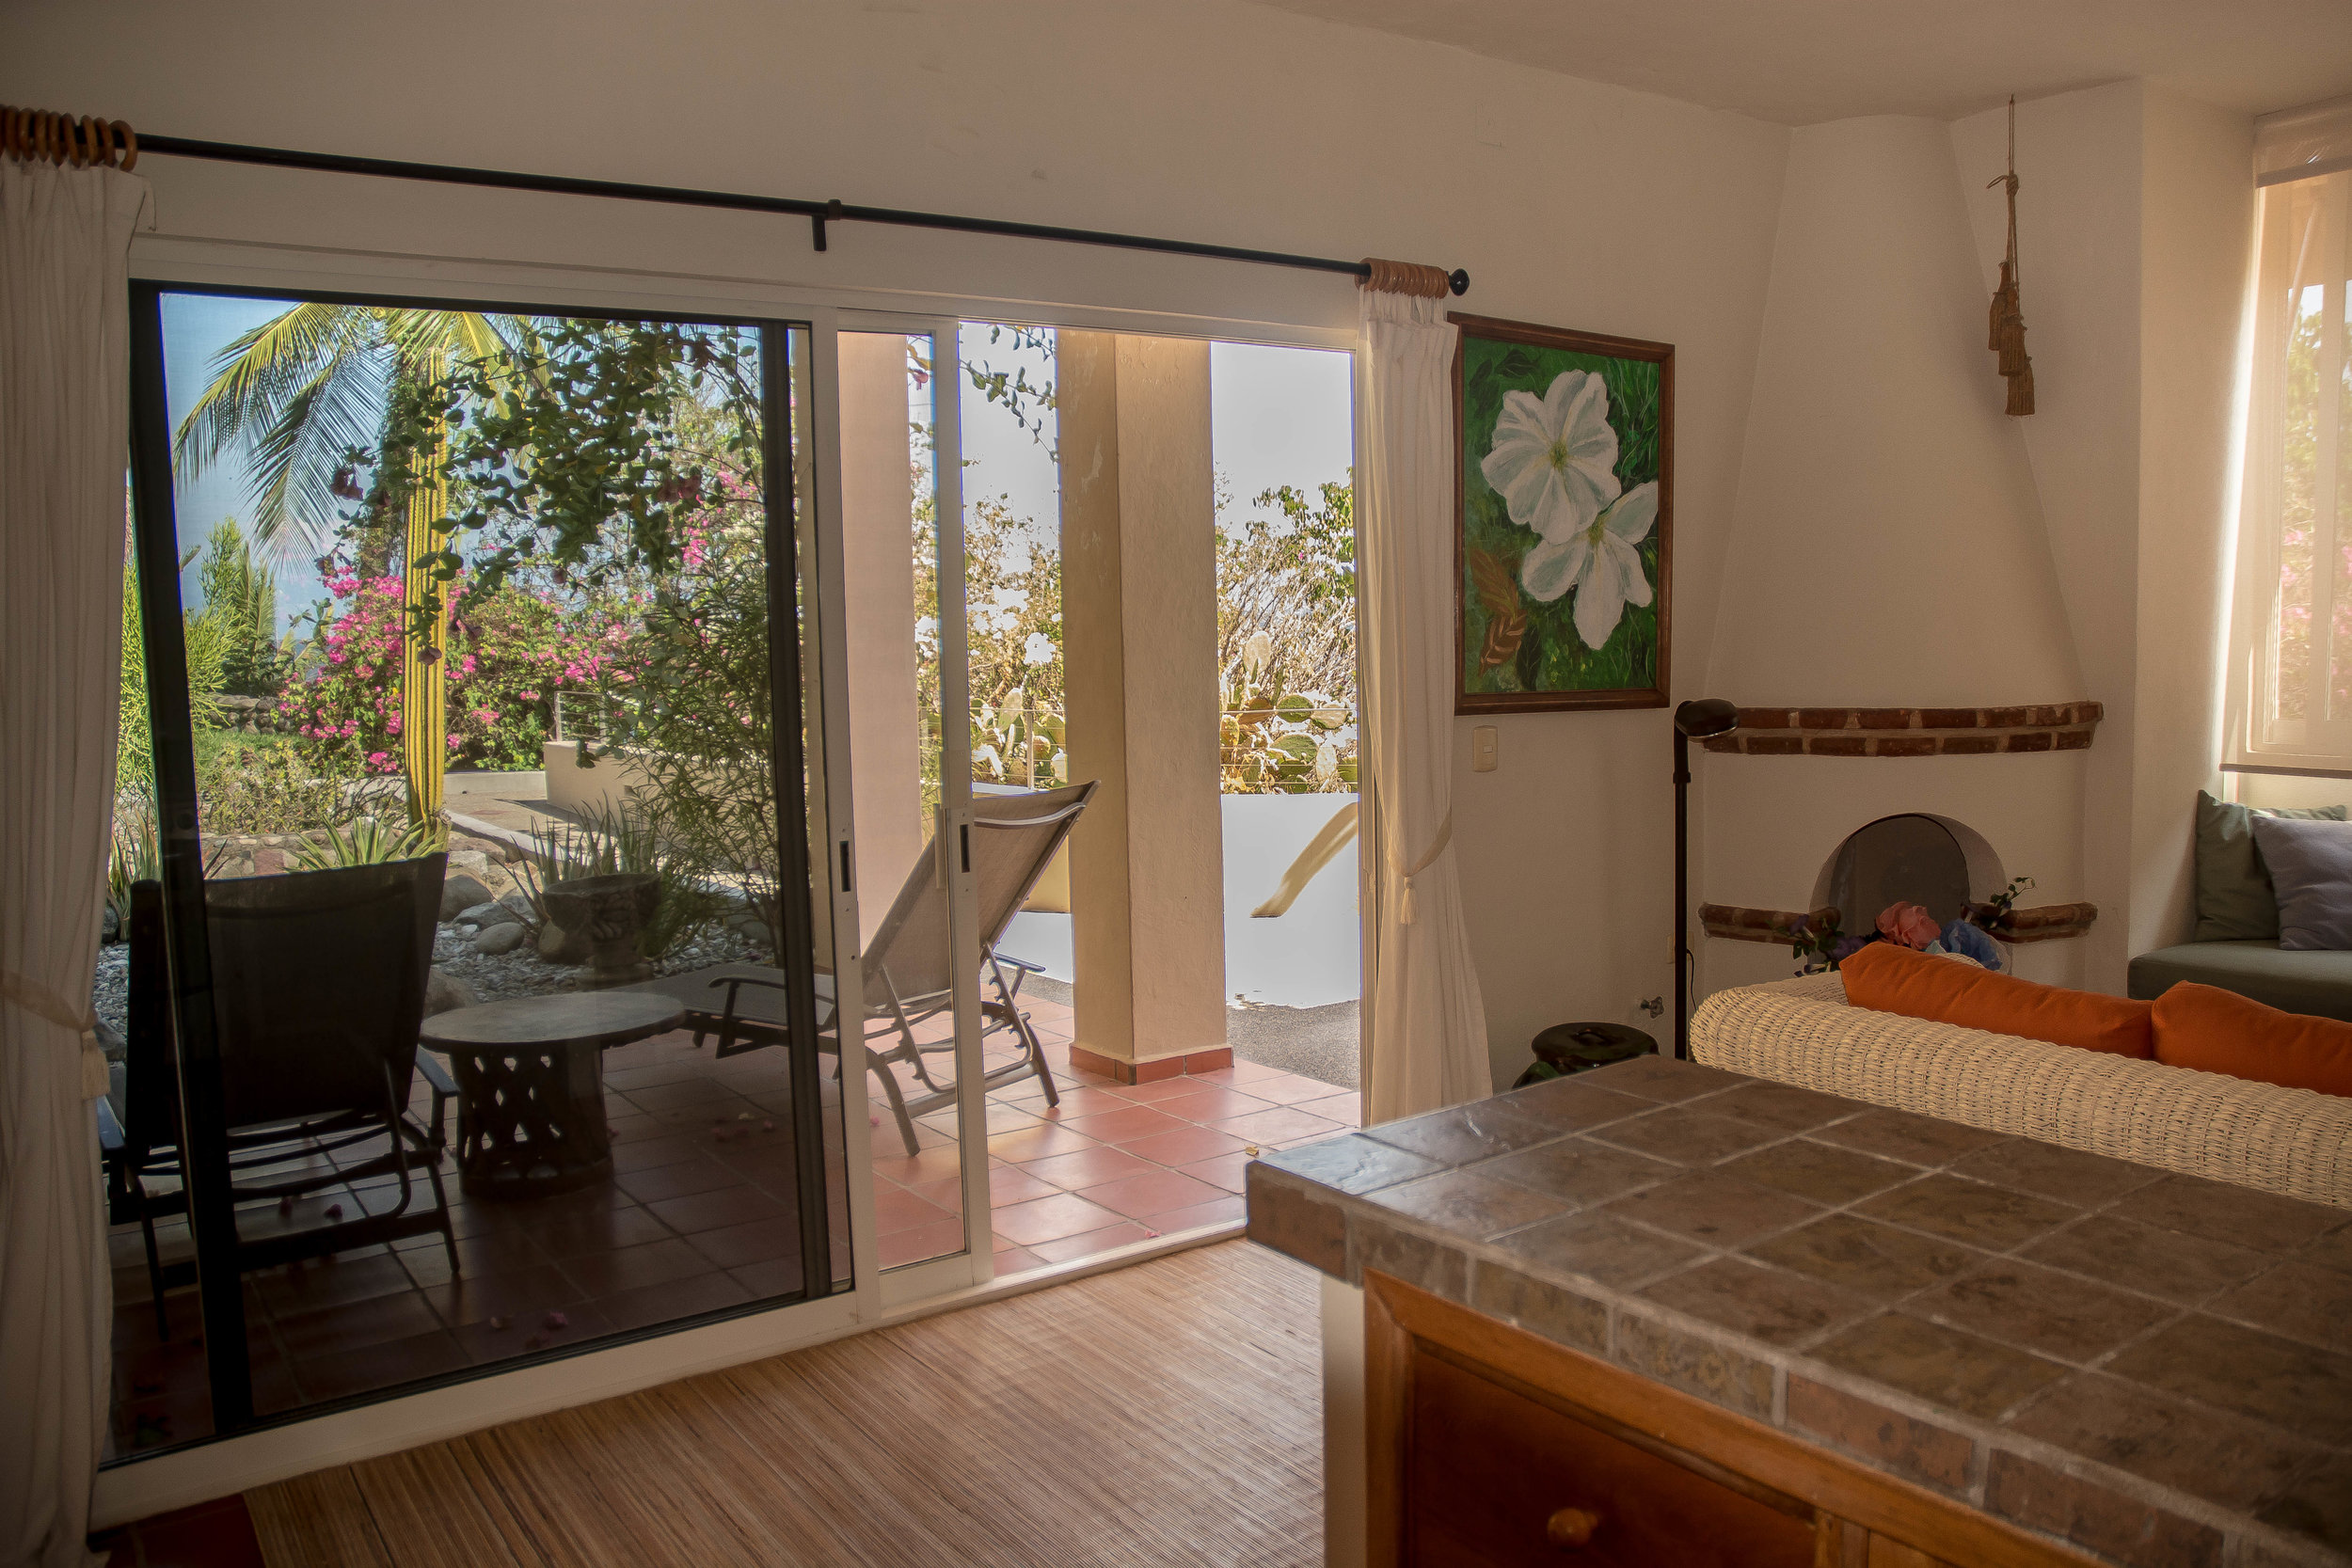 Lower deck kitchen/living room.